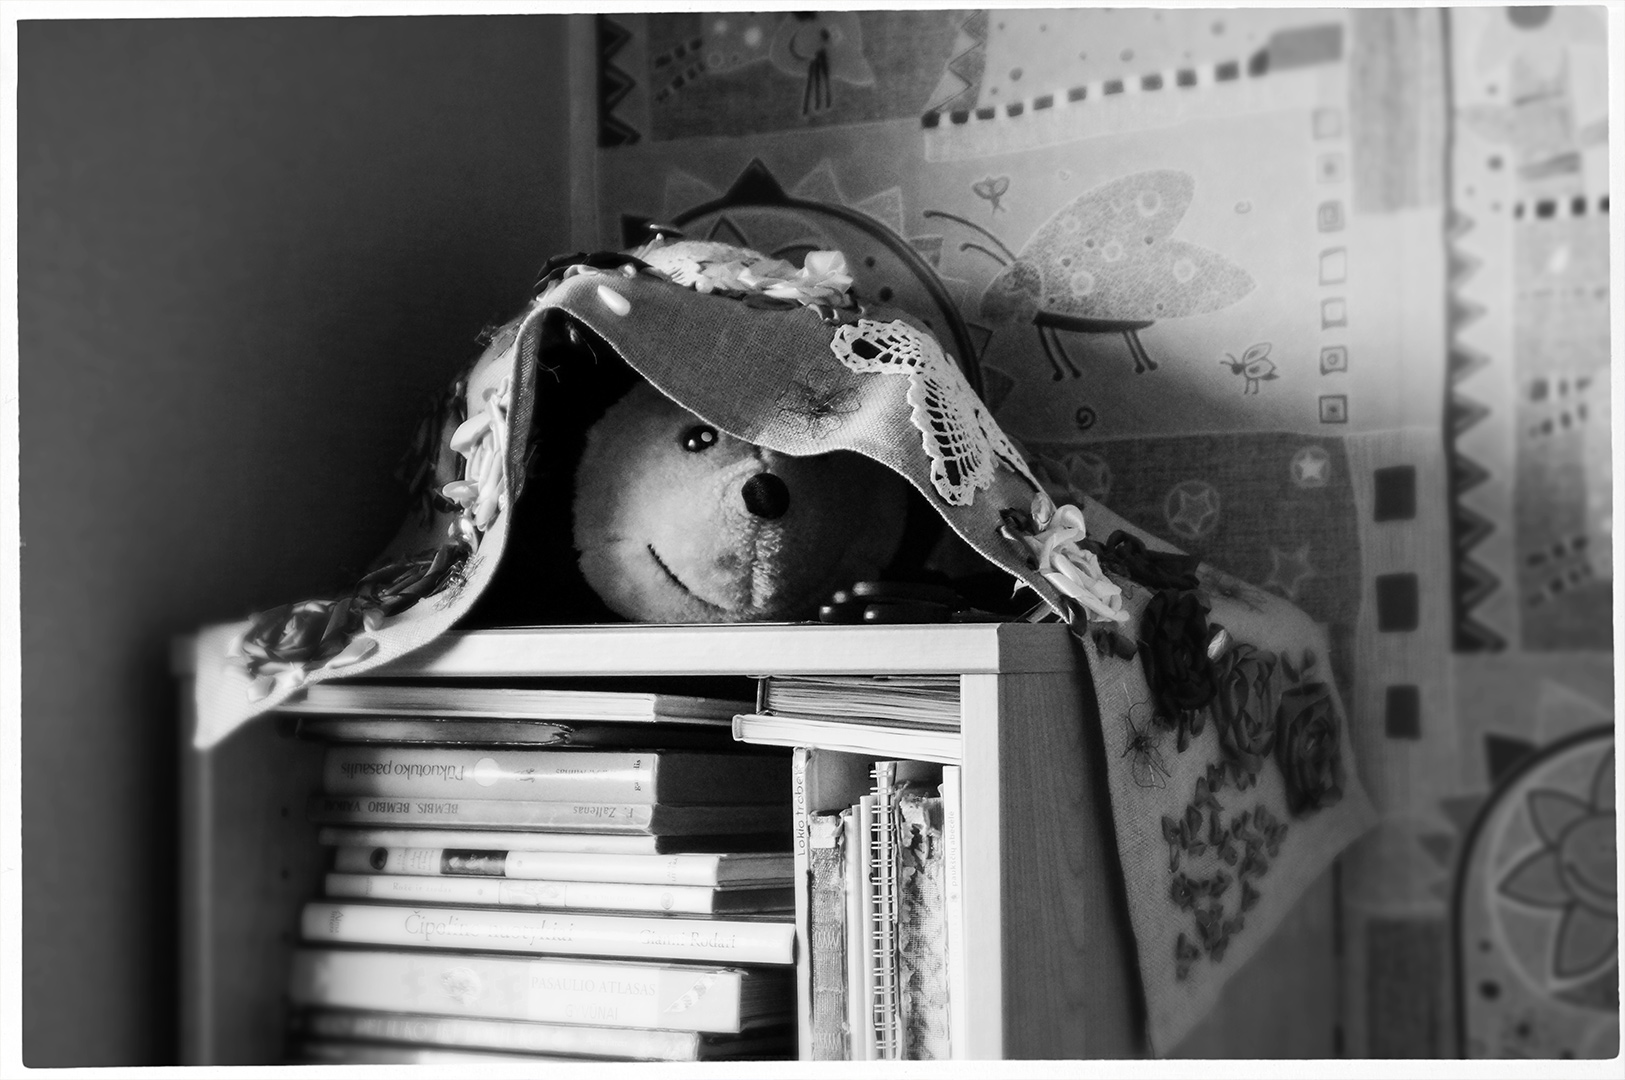 Namų biblioteka. manipuliacija.lt nuotrauka